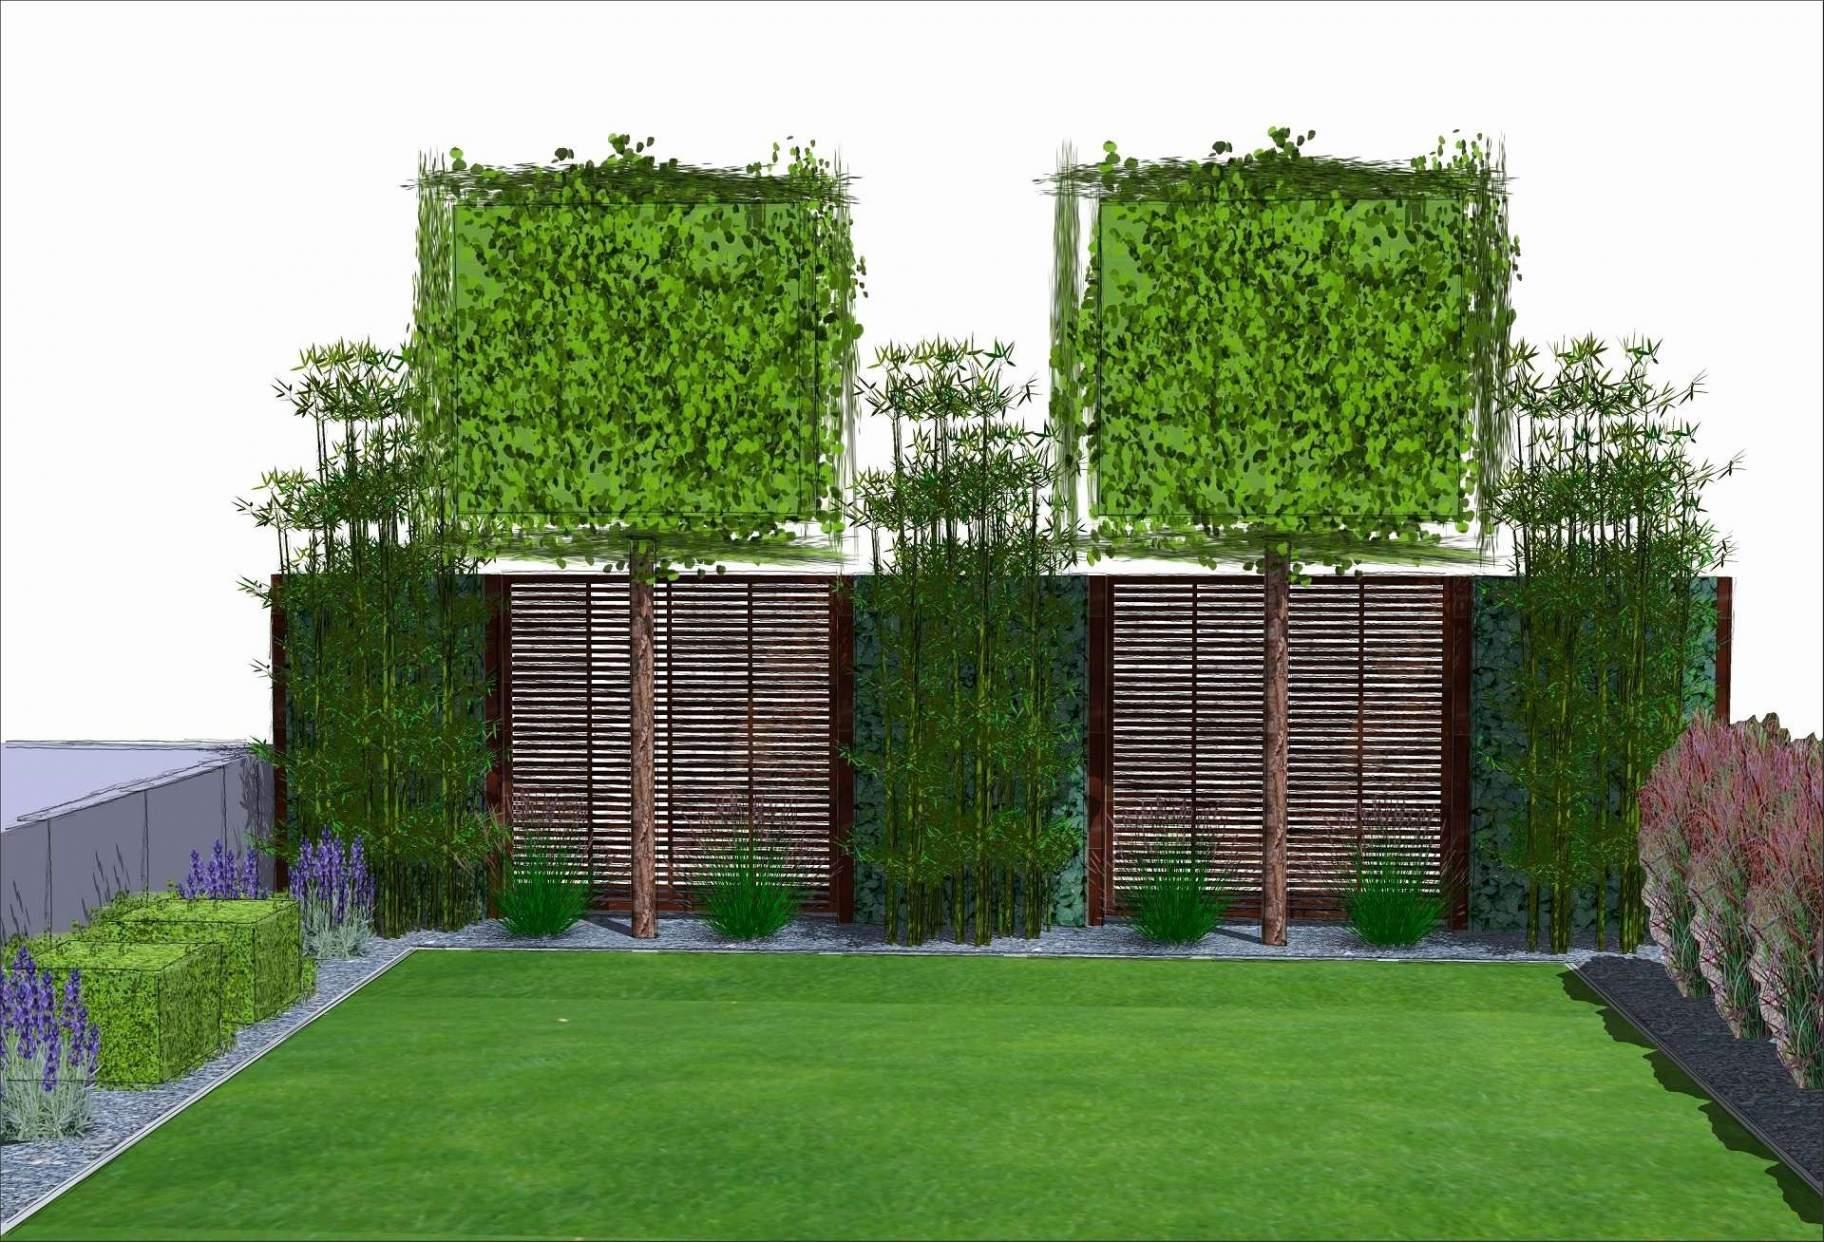 garten pflanzen sichtschutz genial garten pflanzen gartenpflanzen 0d hohe pflanzen als sichtschutz hohe pflanzen als sichtschutz